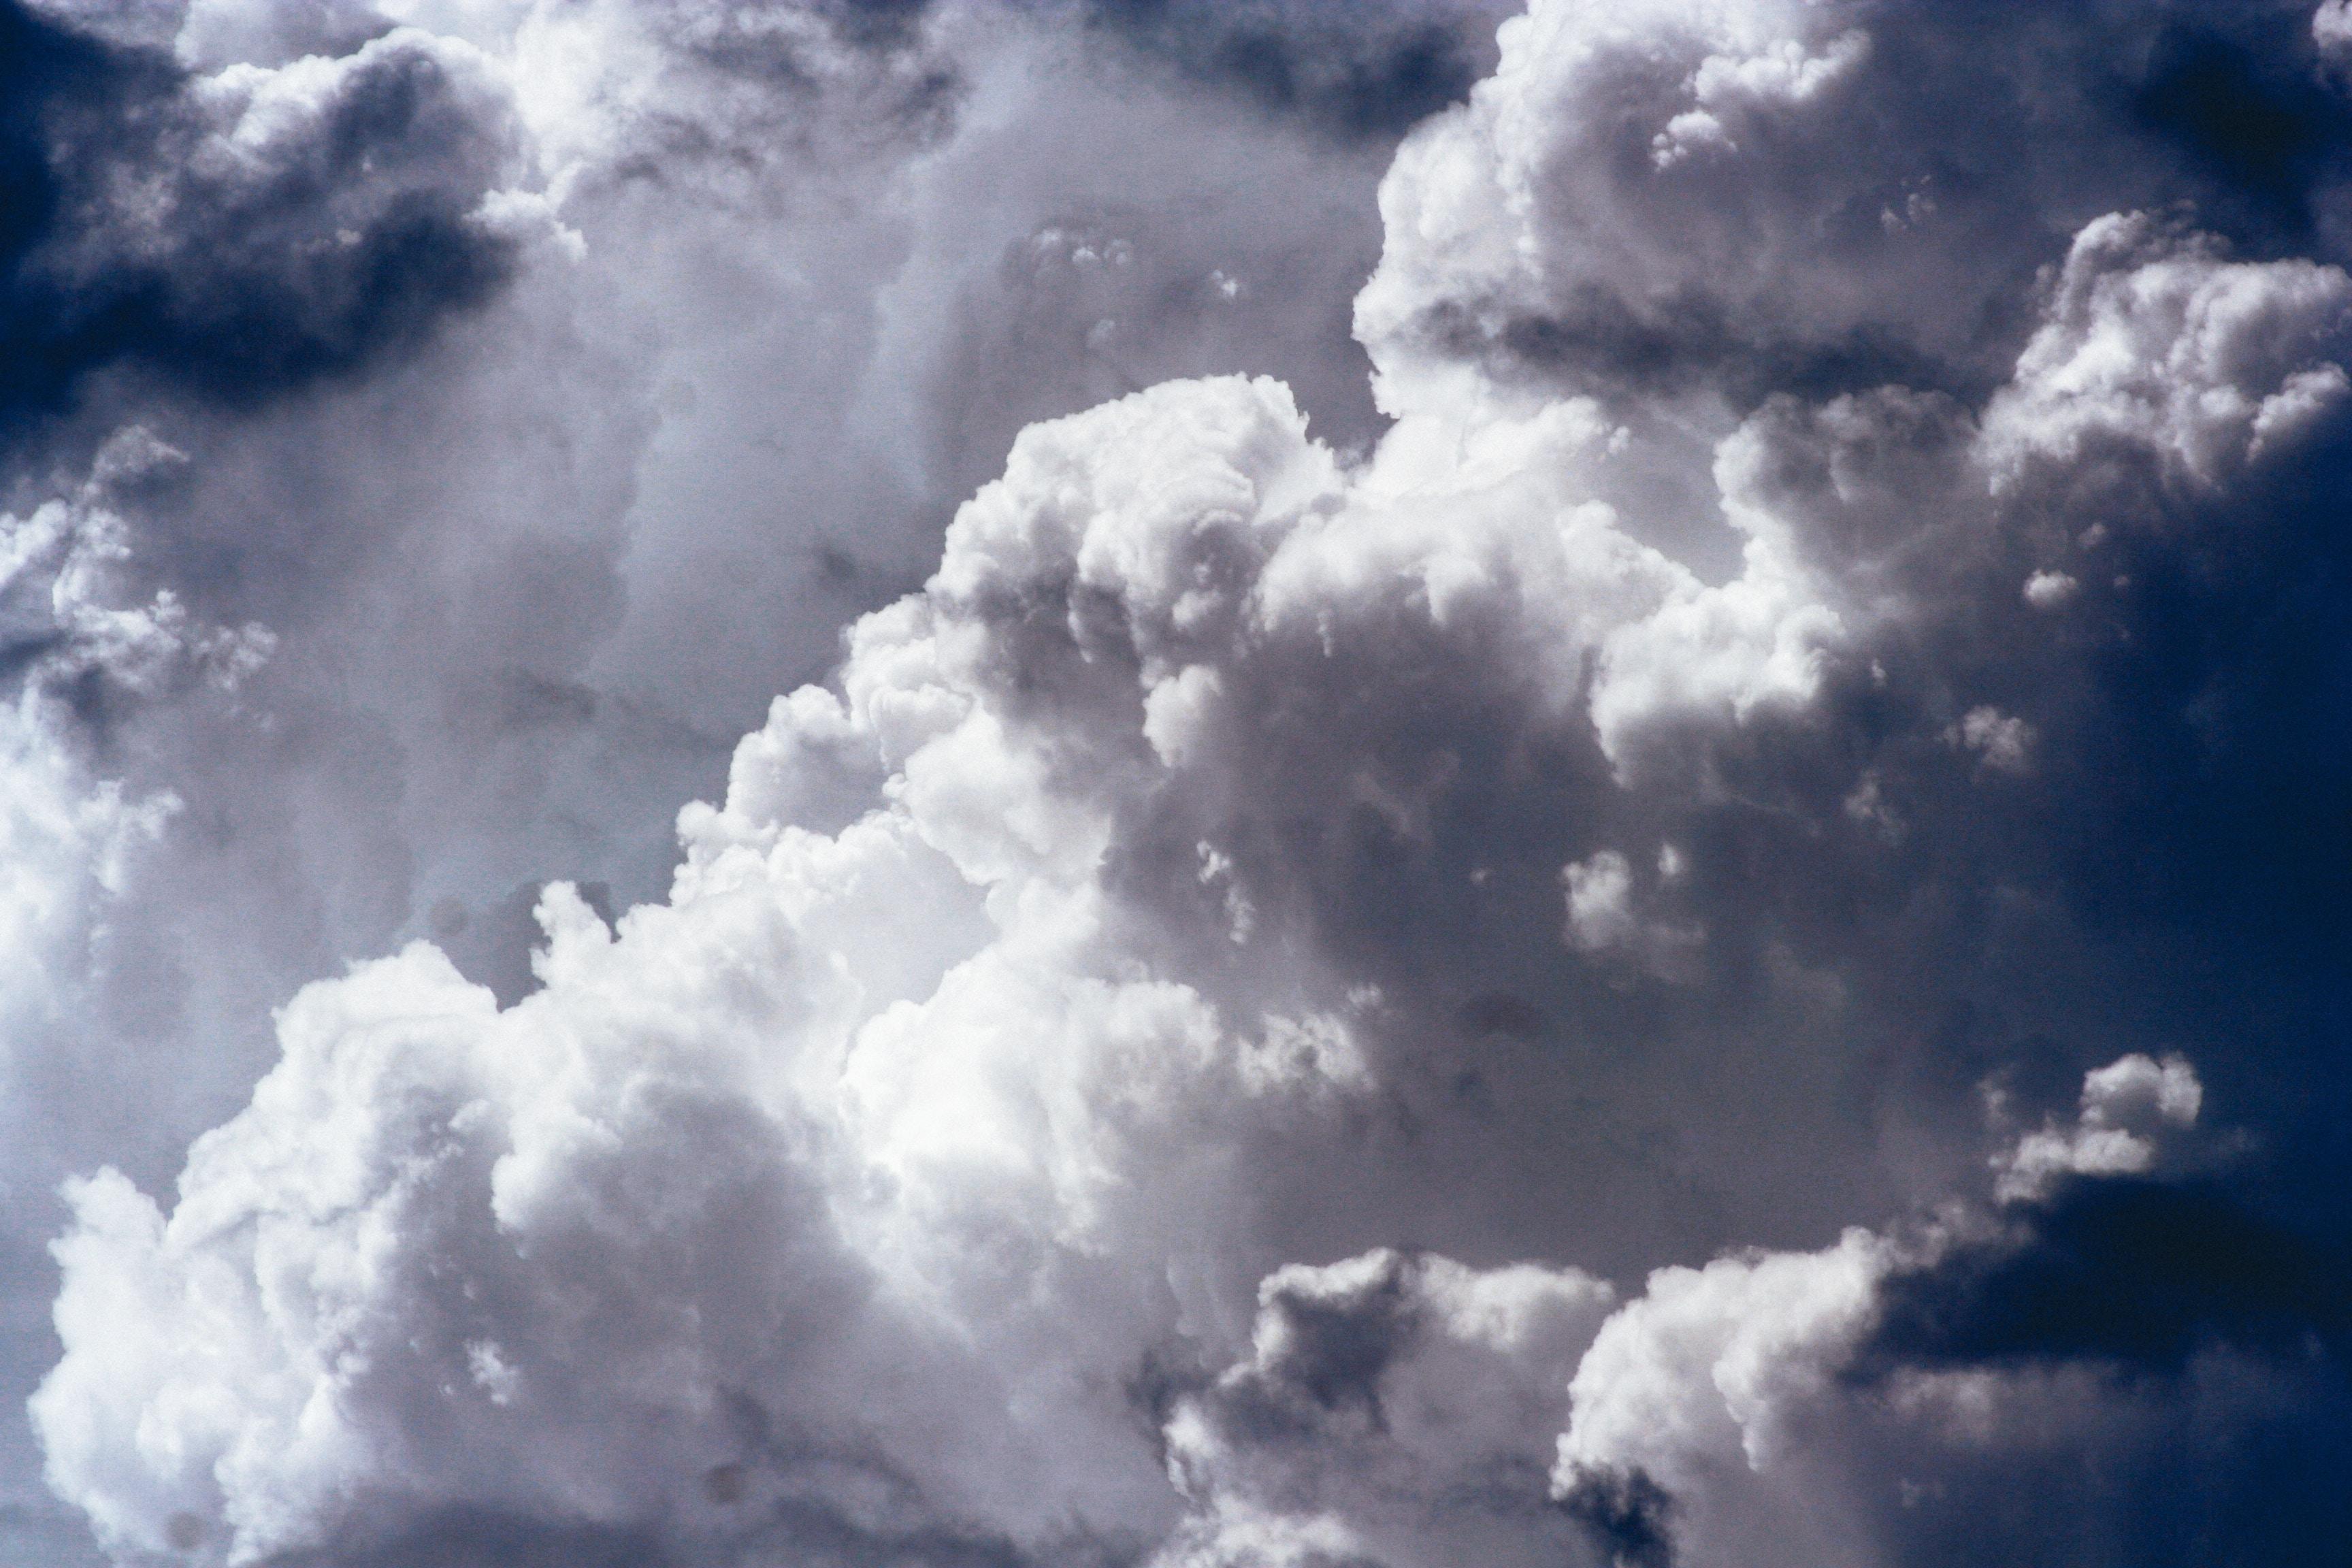 Weather clouds unsplash